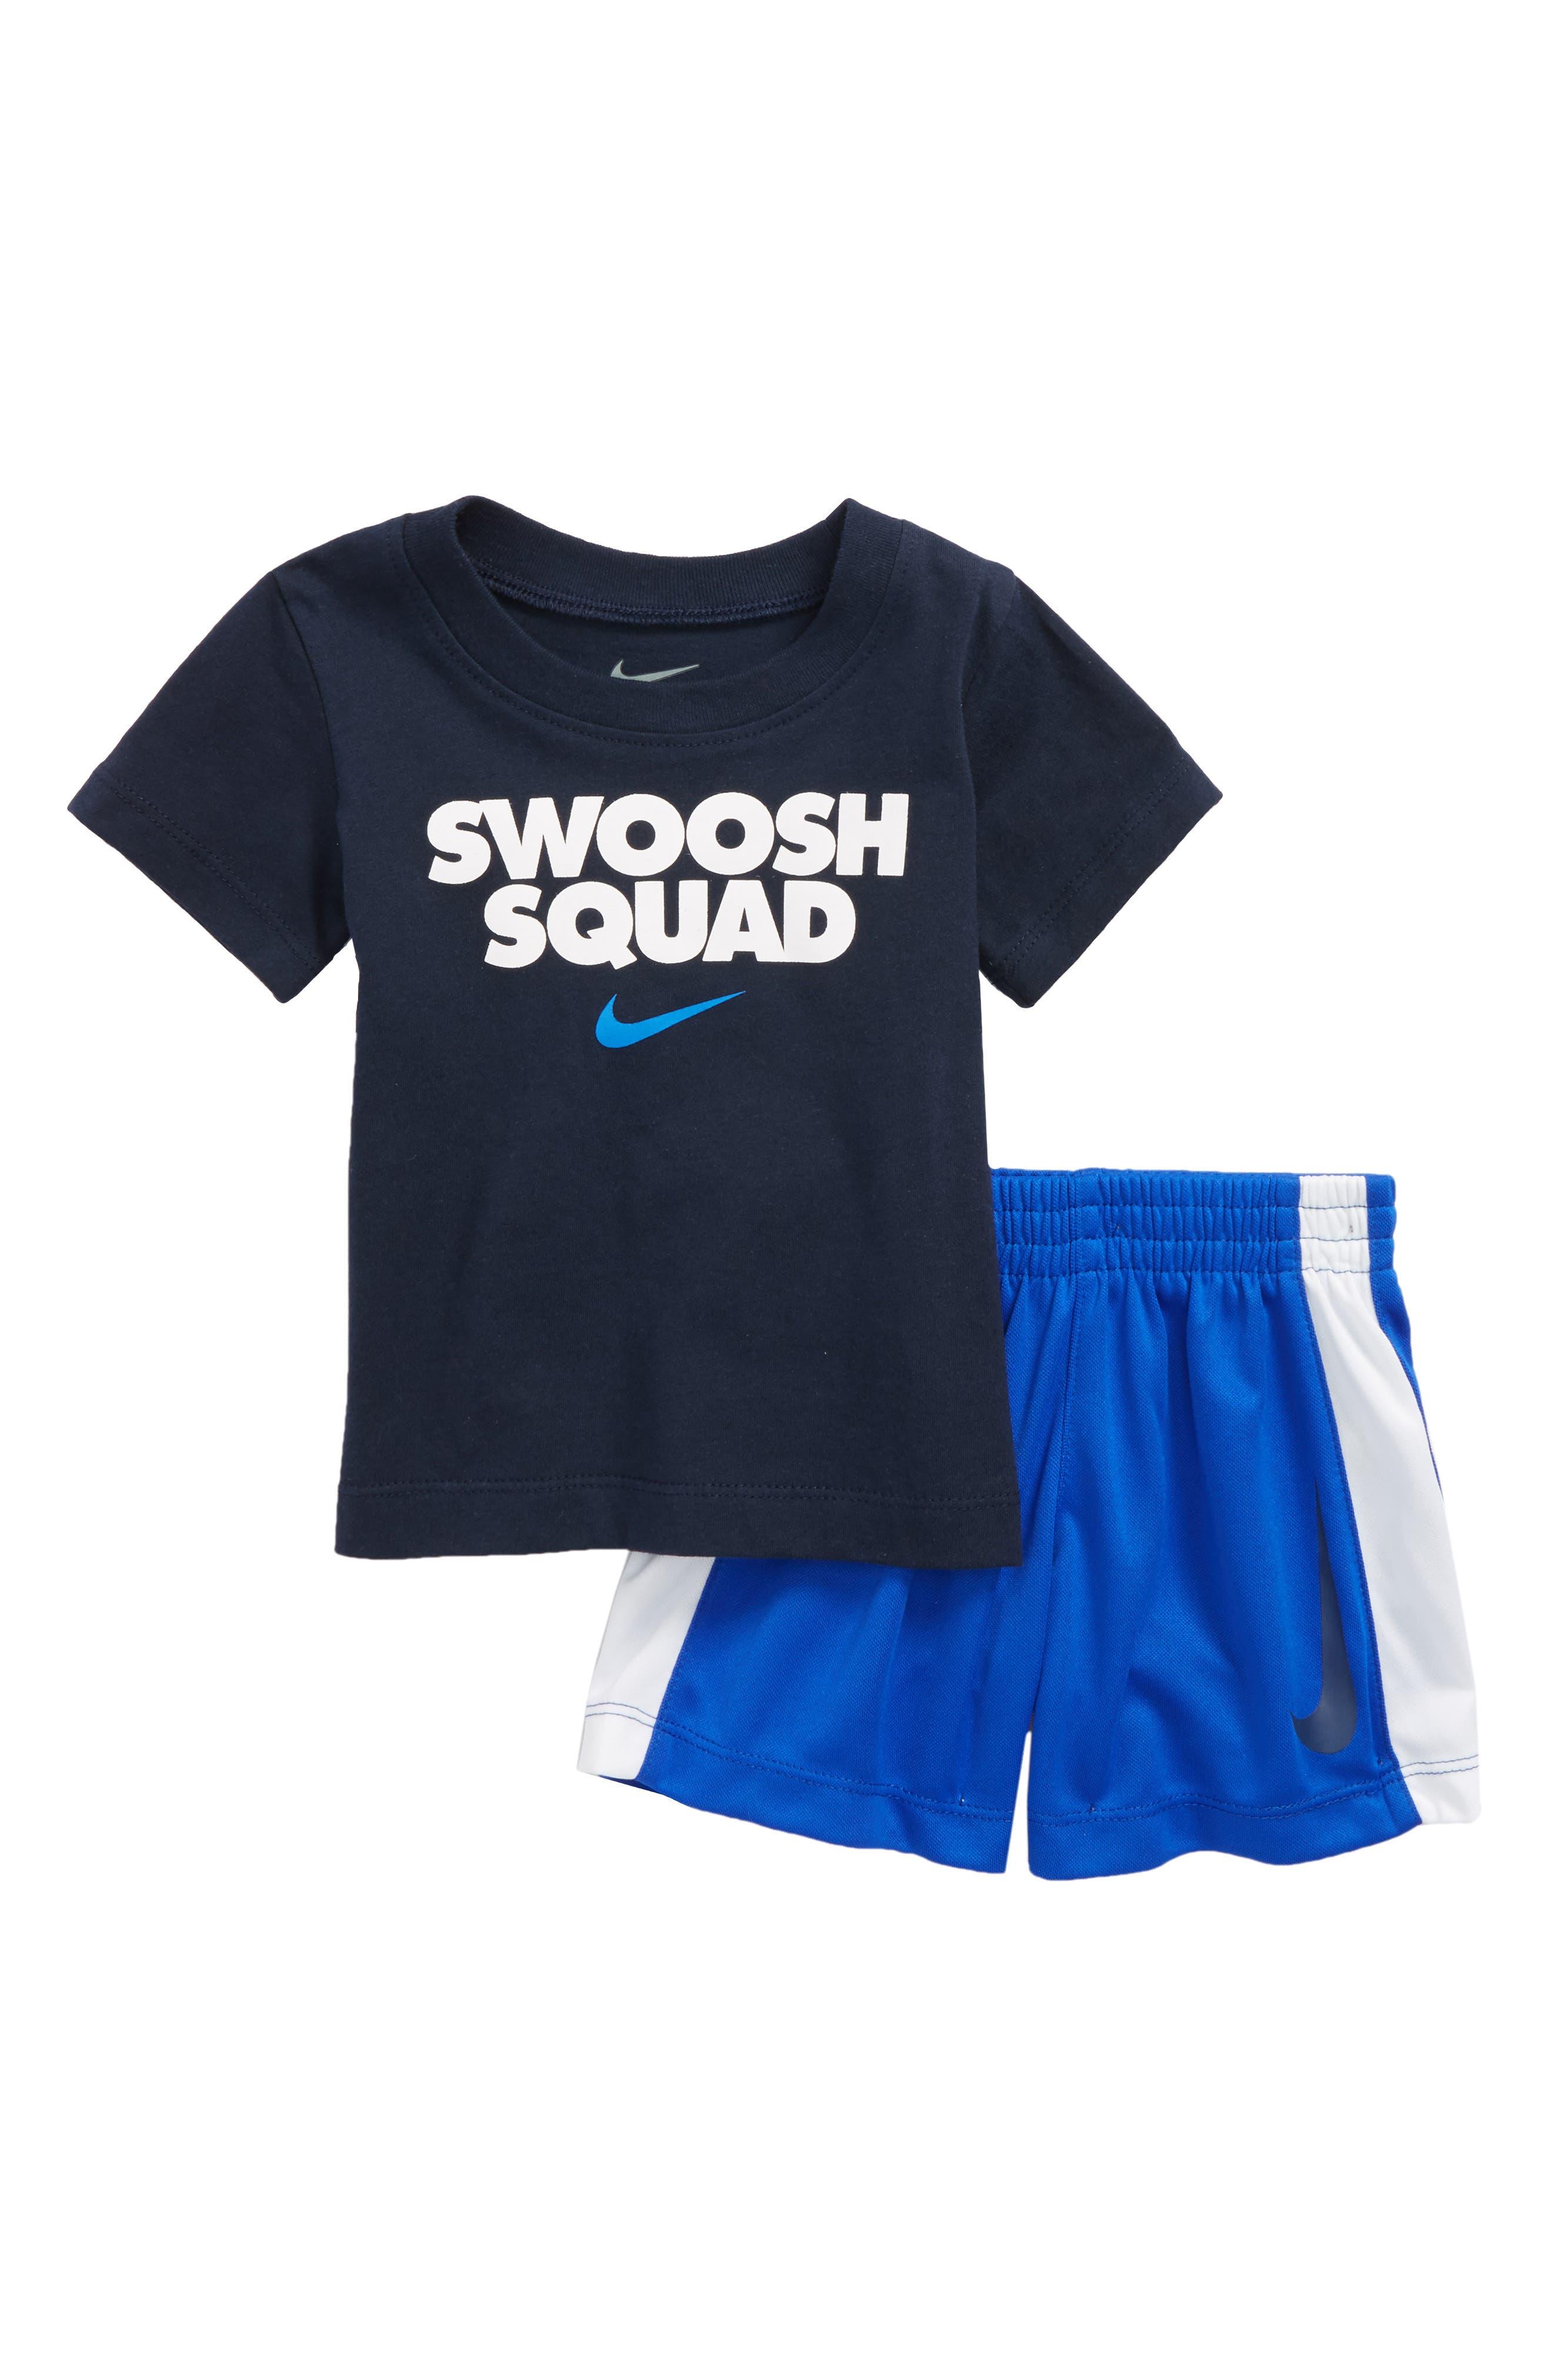 Swoosh Squad T-Shirt & Shorts Set,                         Main,                         color, 434